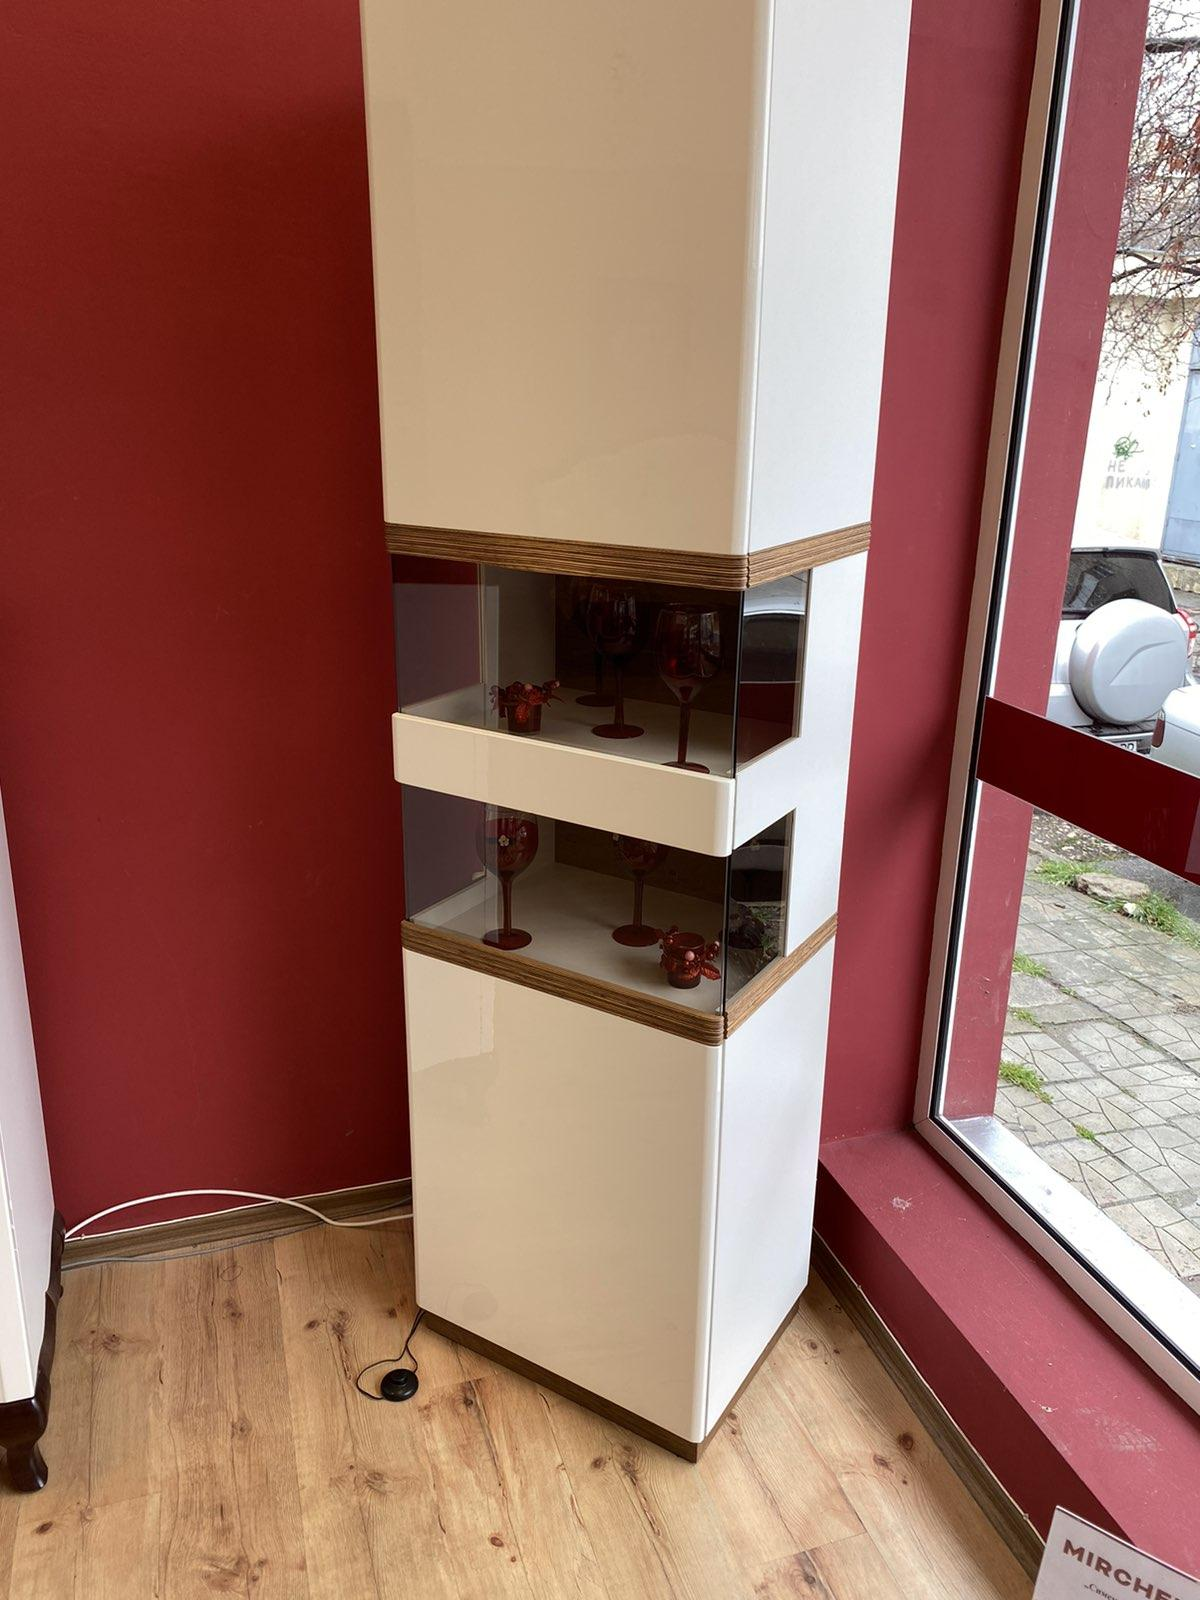 Единична витрина - CM-W1/2 Como - арт мебели естествено дърво